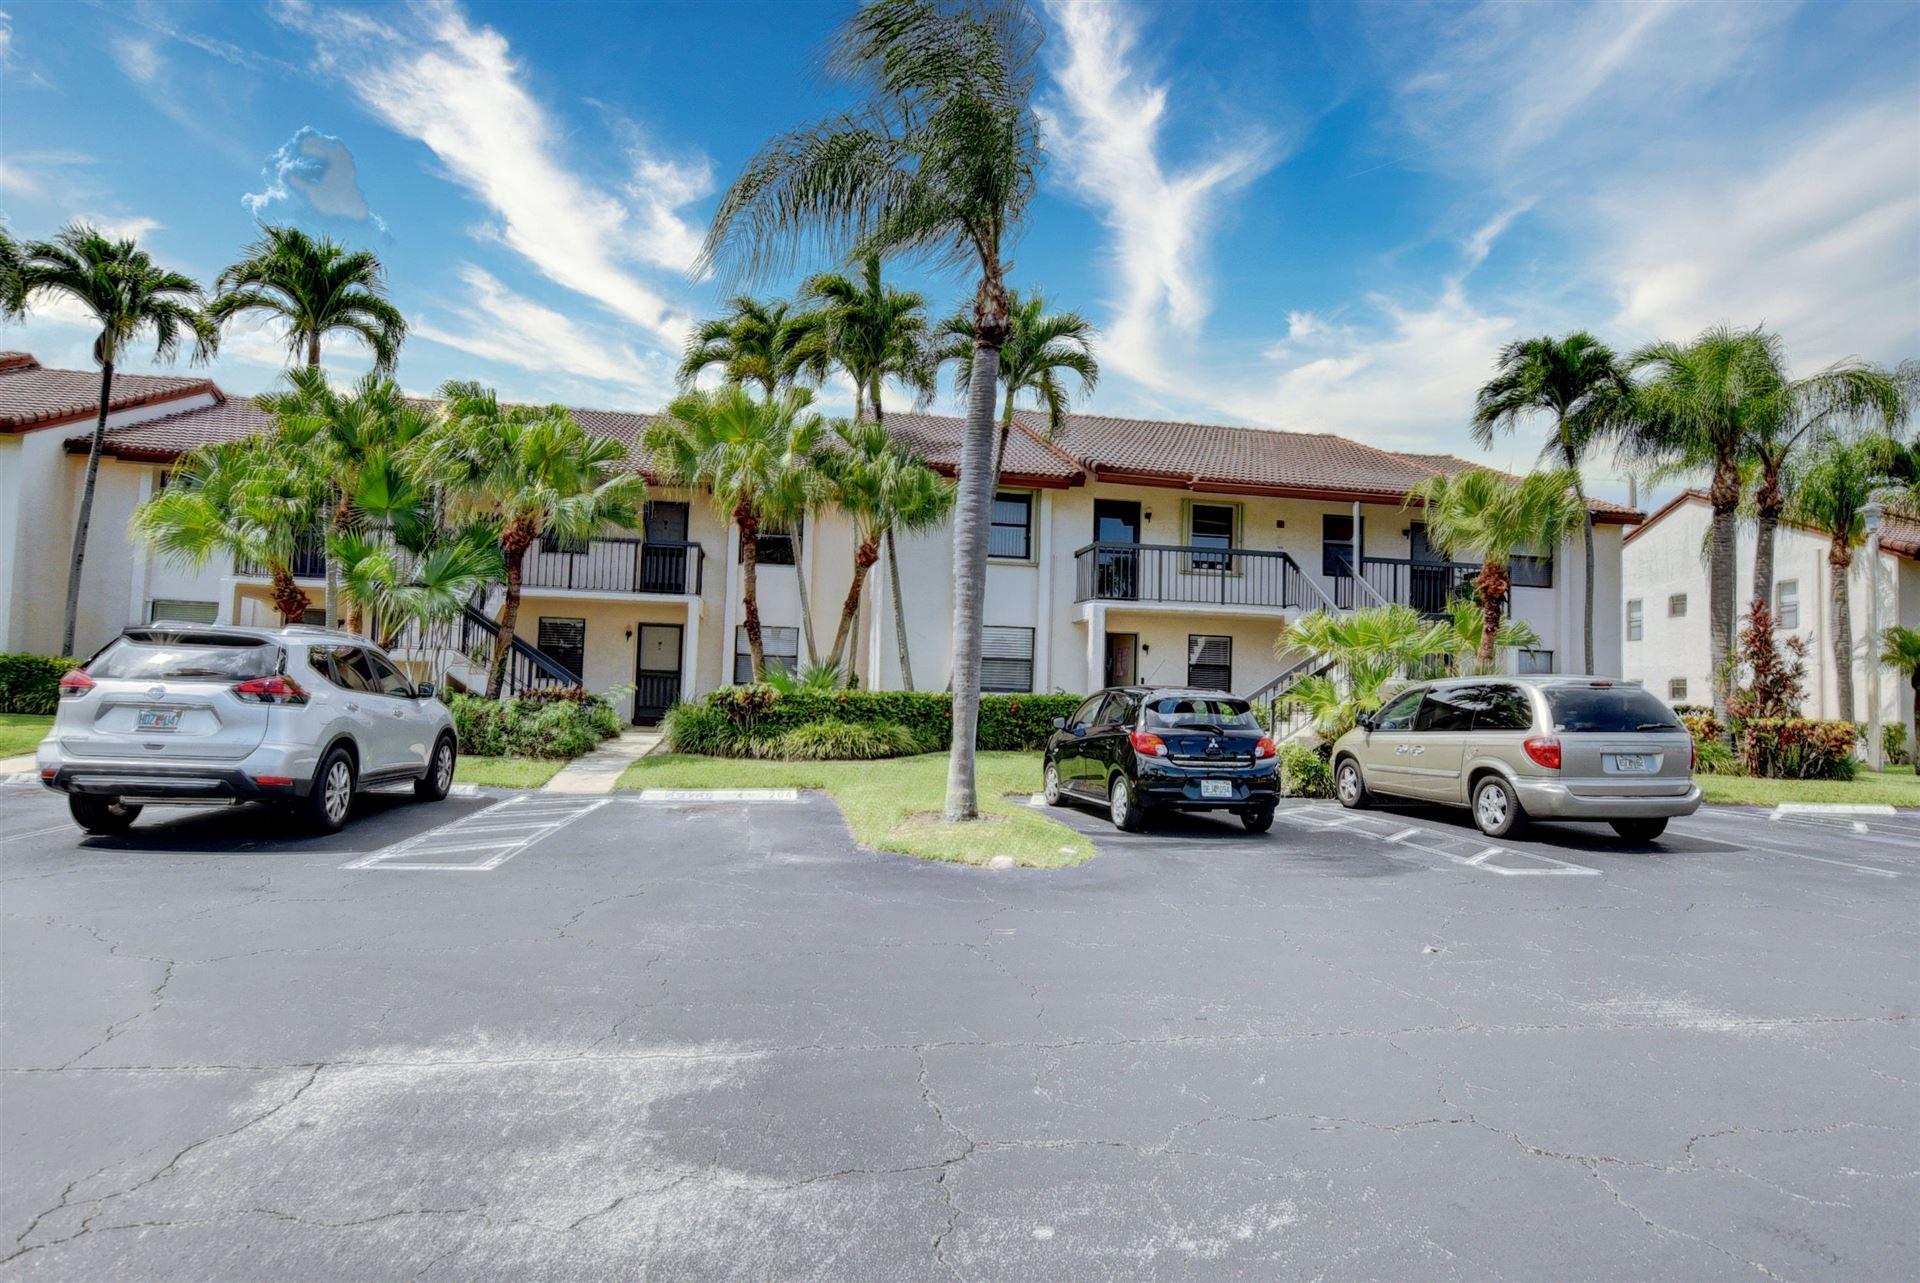 22100 Palms Way #104, Boca Raton, FL 33433 - #: RX-10632350